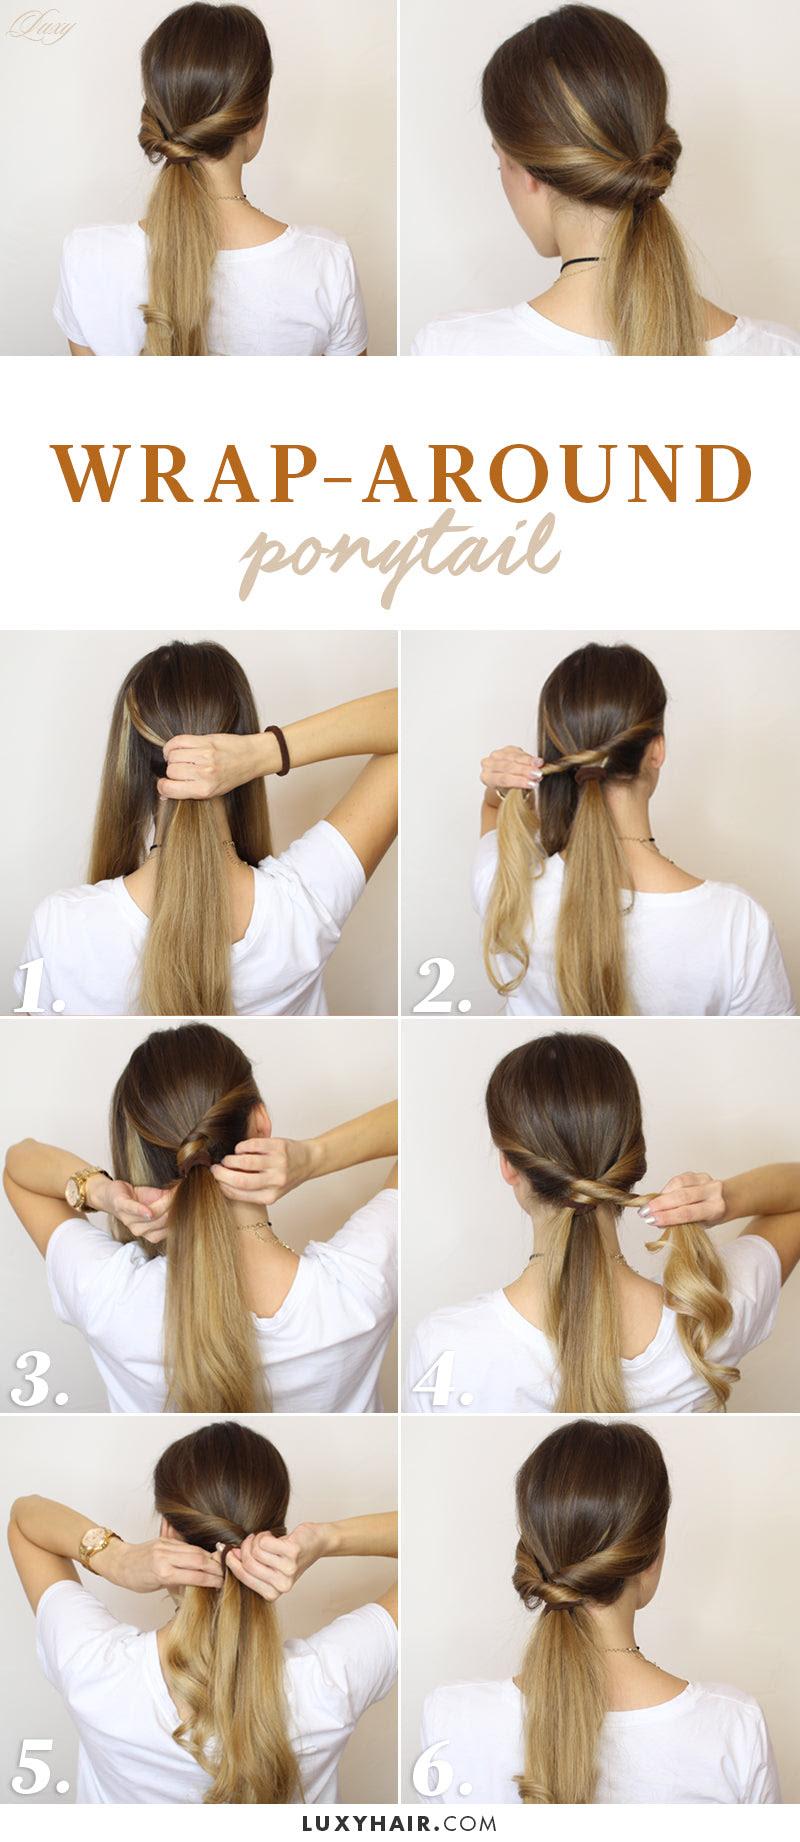 3 Easy Hairstyles For Fall (Heatless) - Luxy Hair